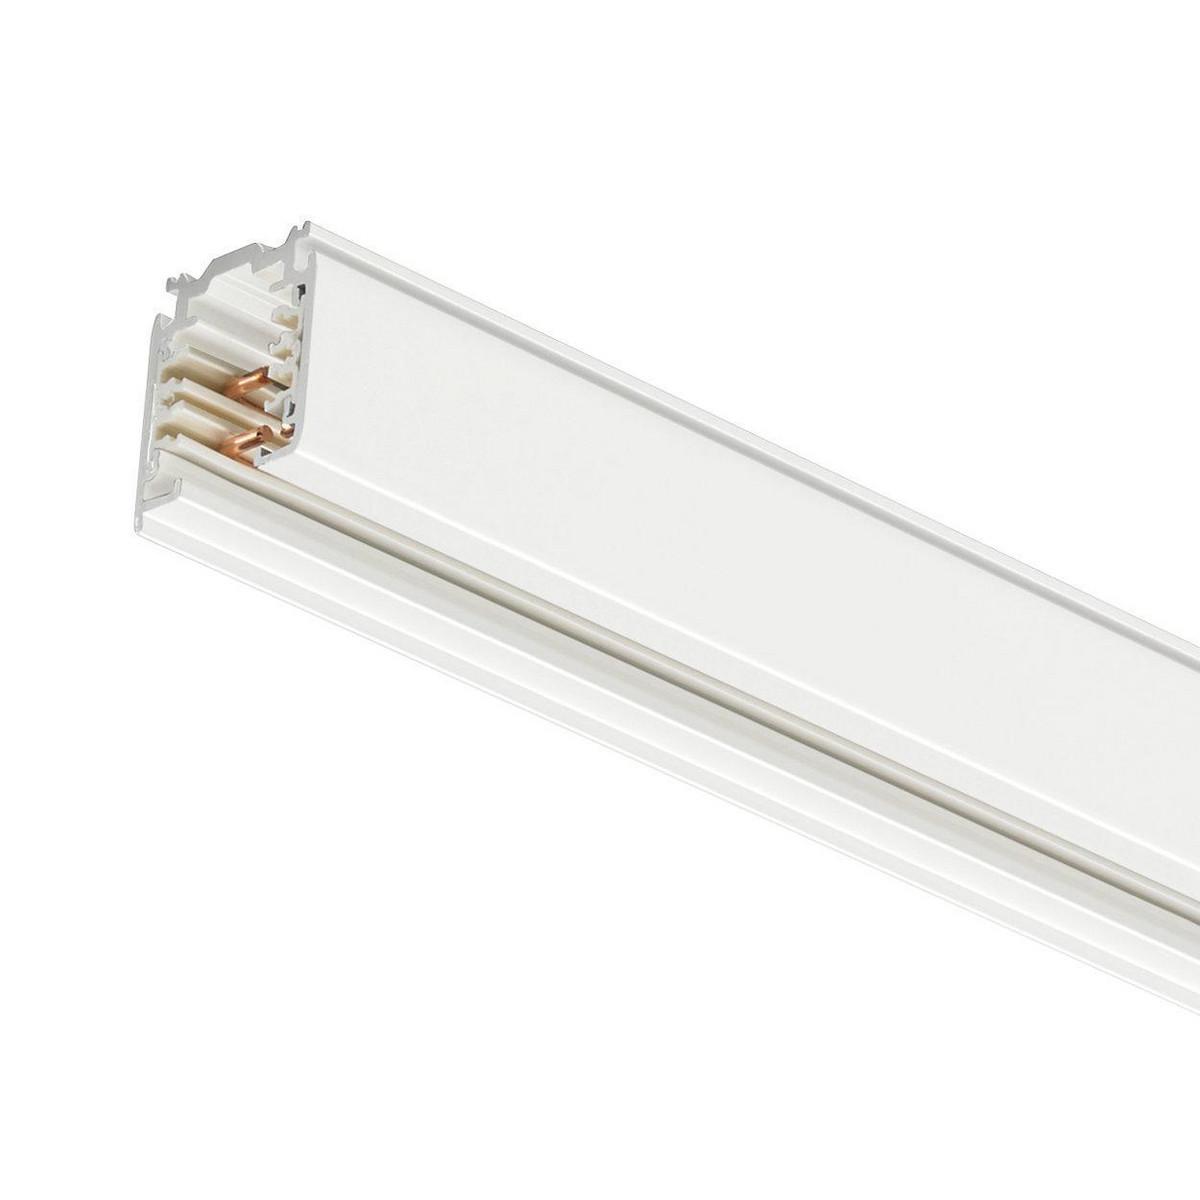 GLOBAL XTSC6100-3 Strømskinne DALI 1M Hvid